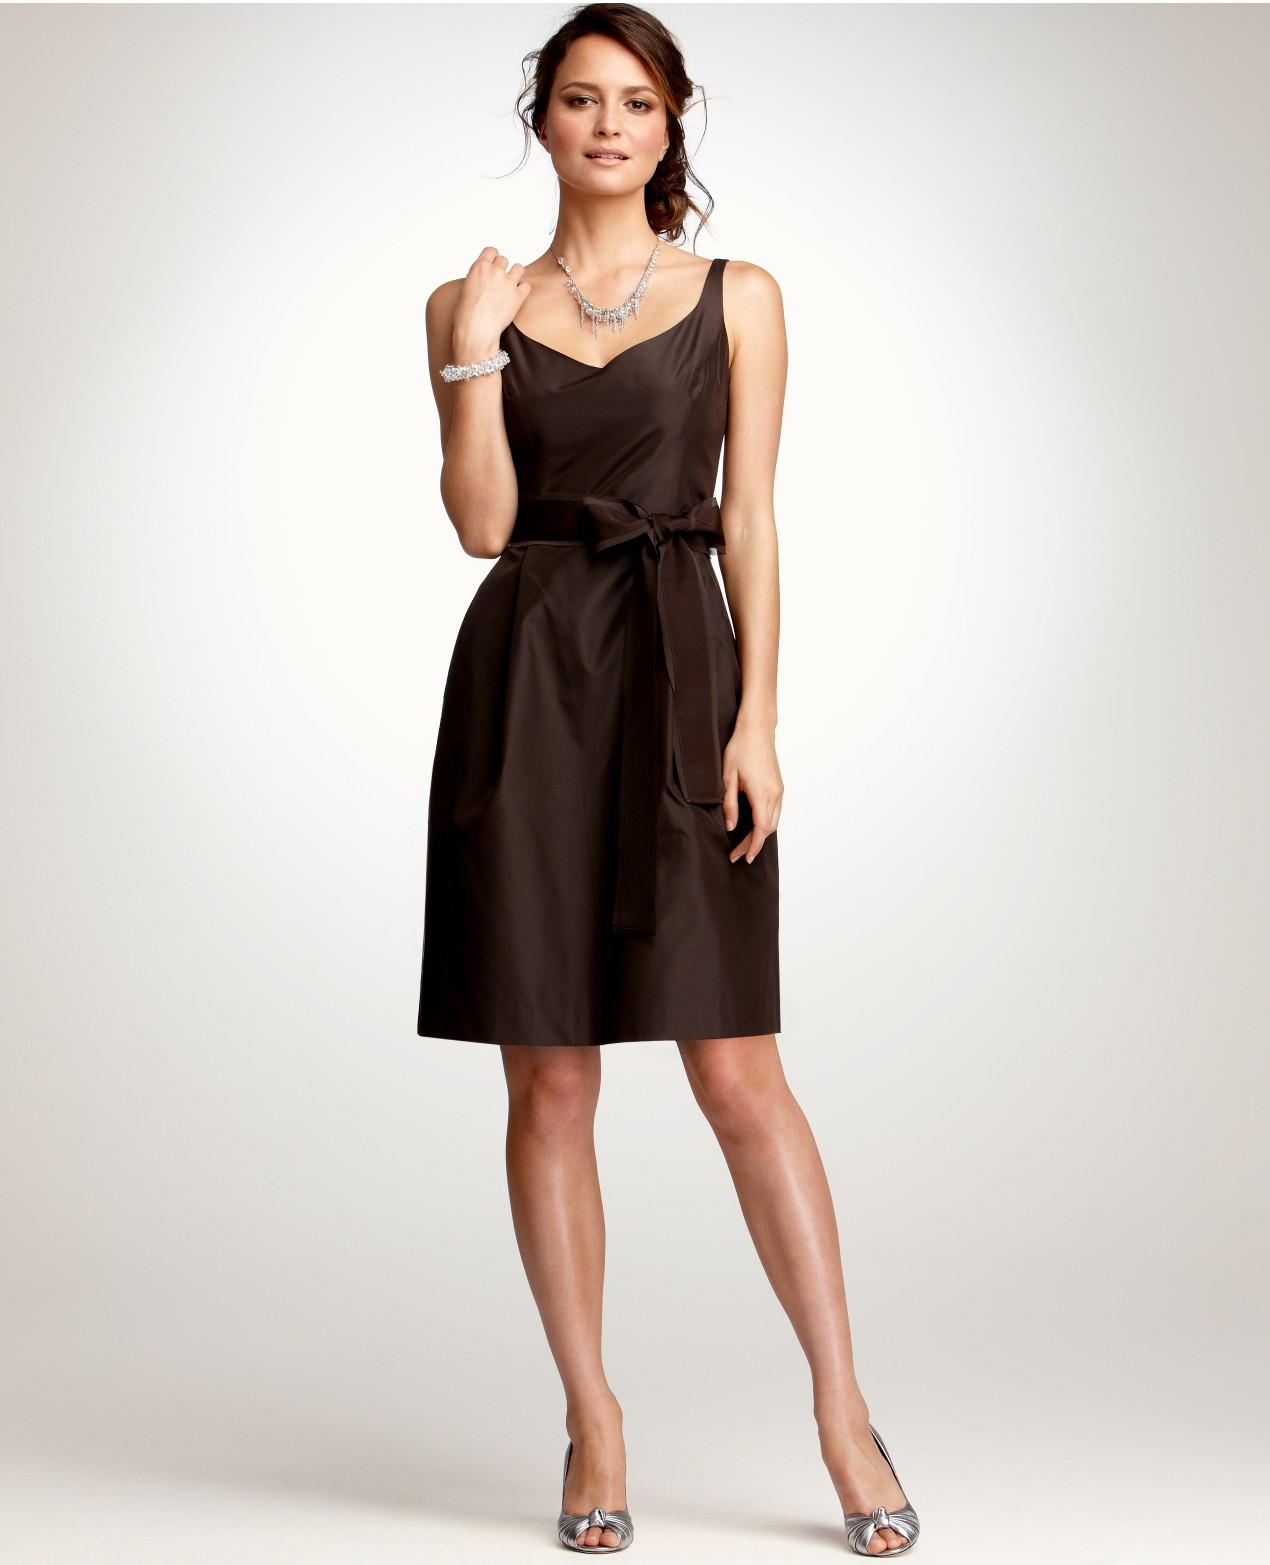 Ann taylor Silk Taffeta Vneck Bridesmaid Dress in Brown